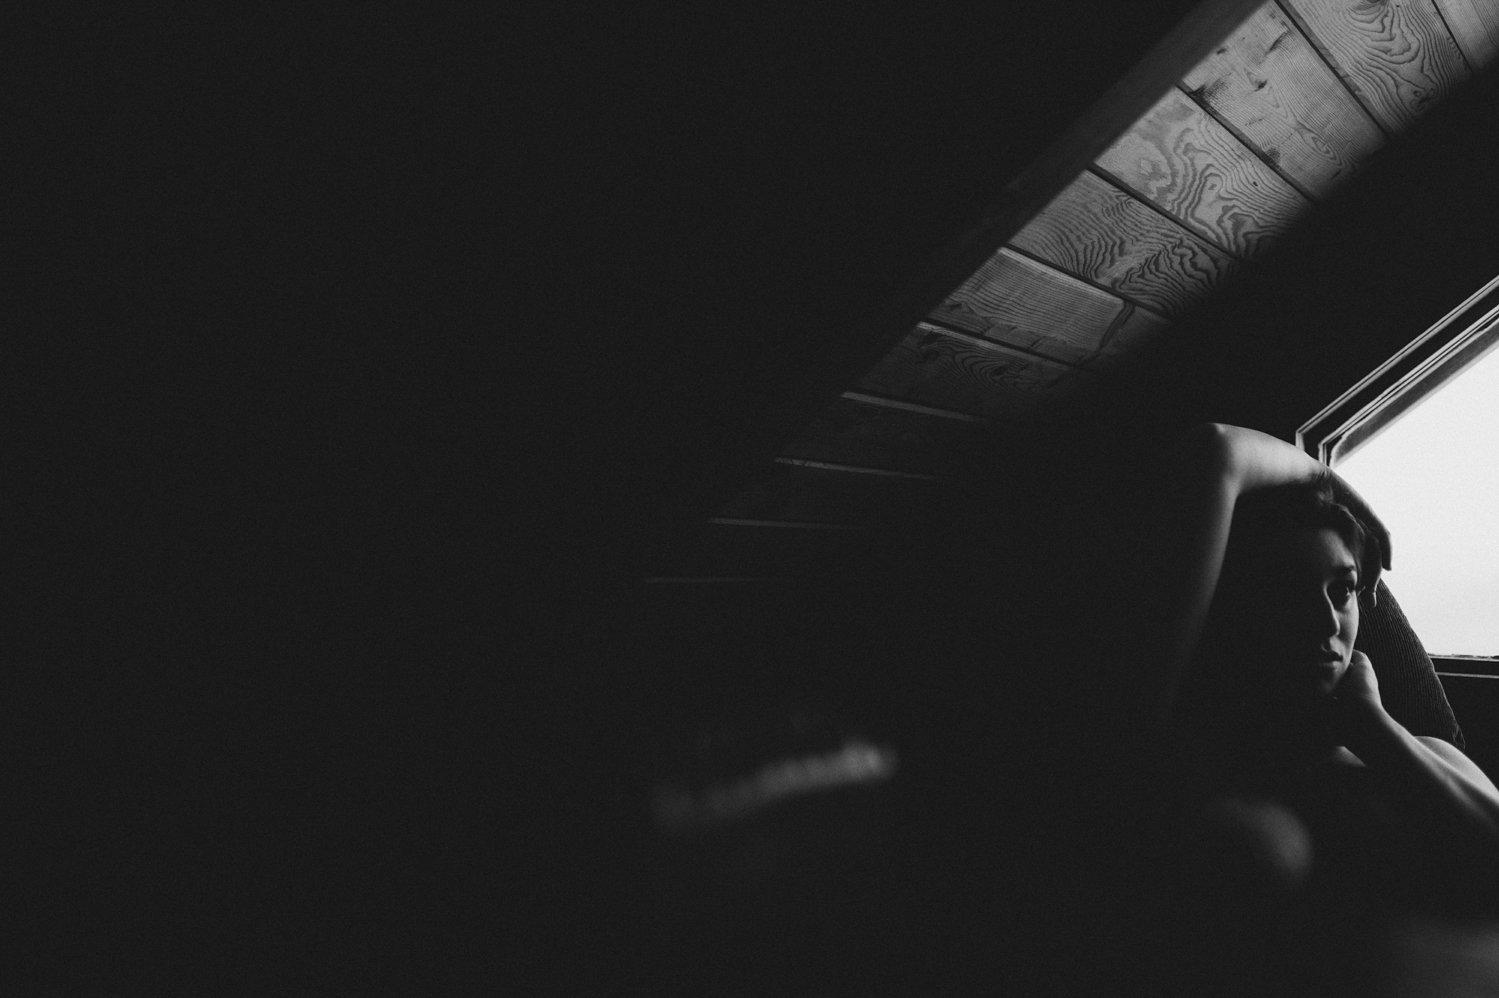 Black and white fine art nude - creative London boudoir photographer - alternative boudoir photography London © Babb Photo